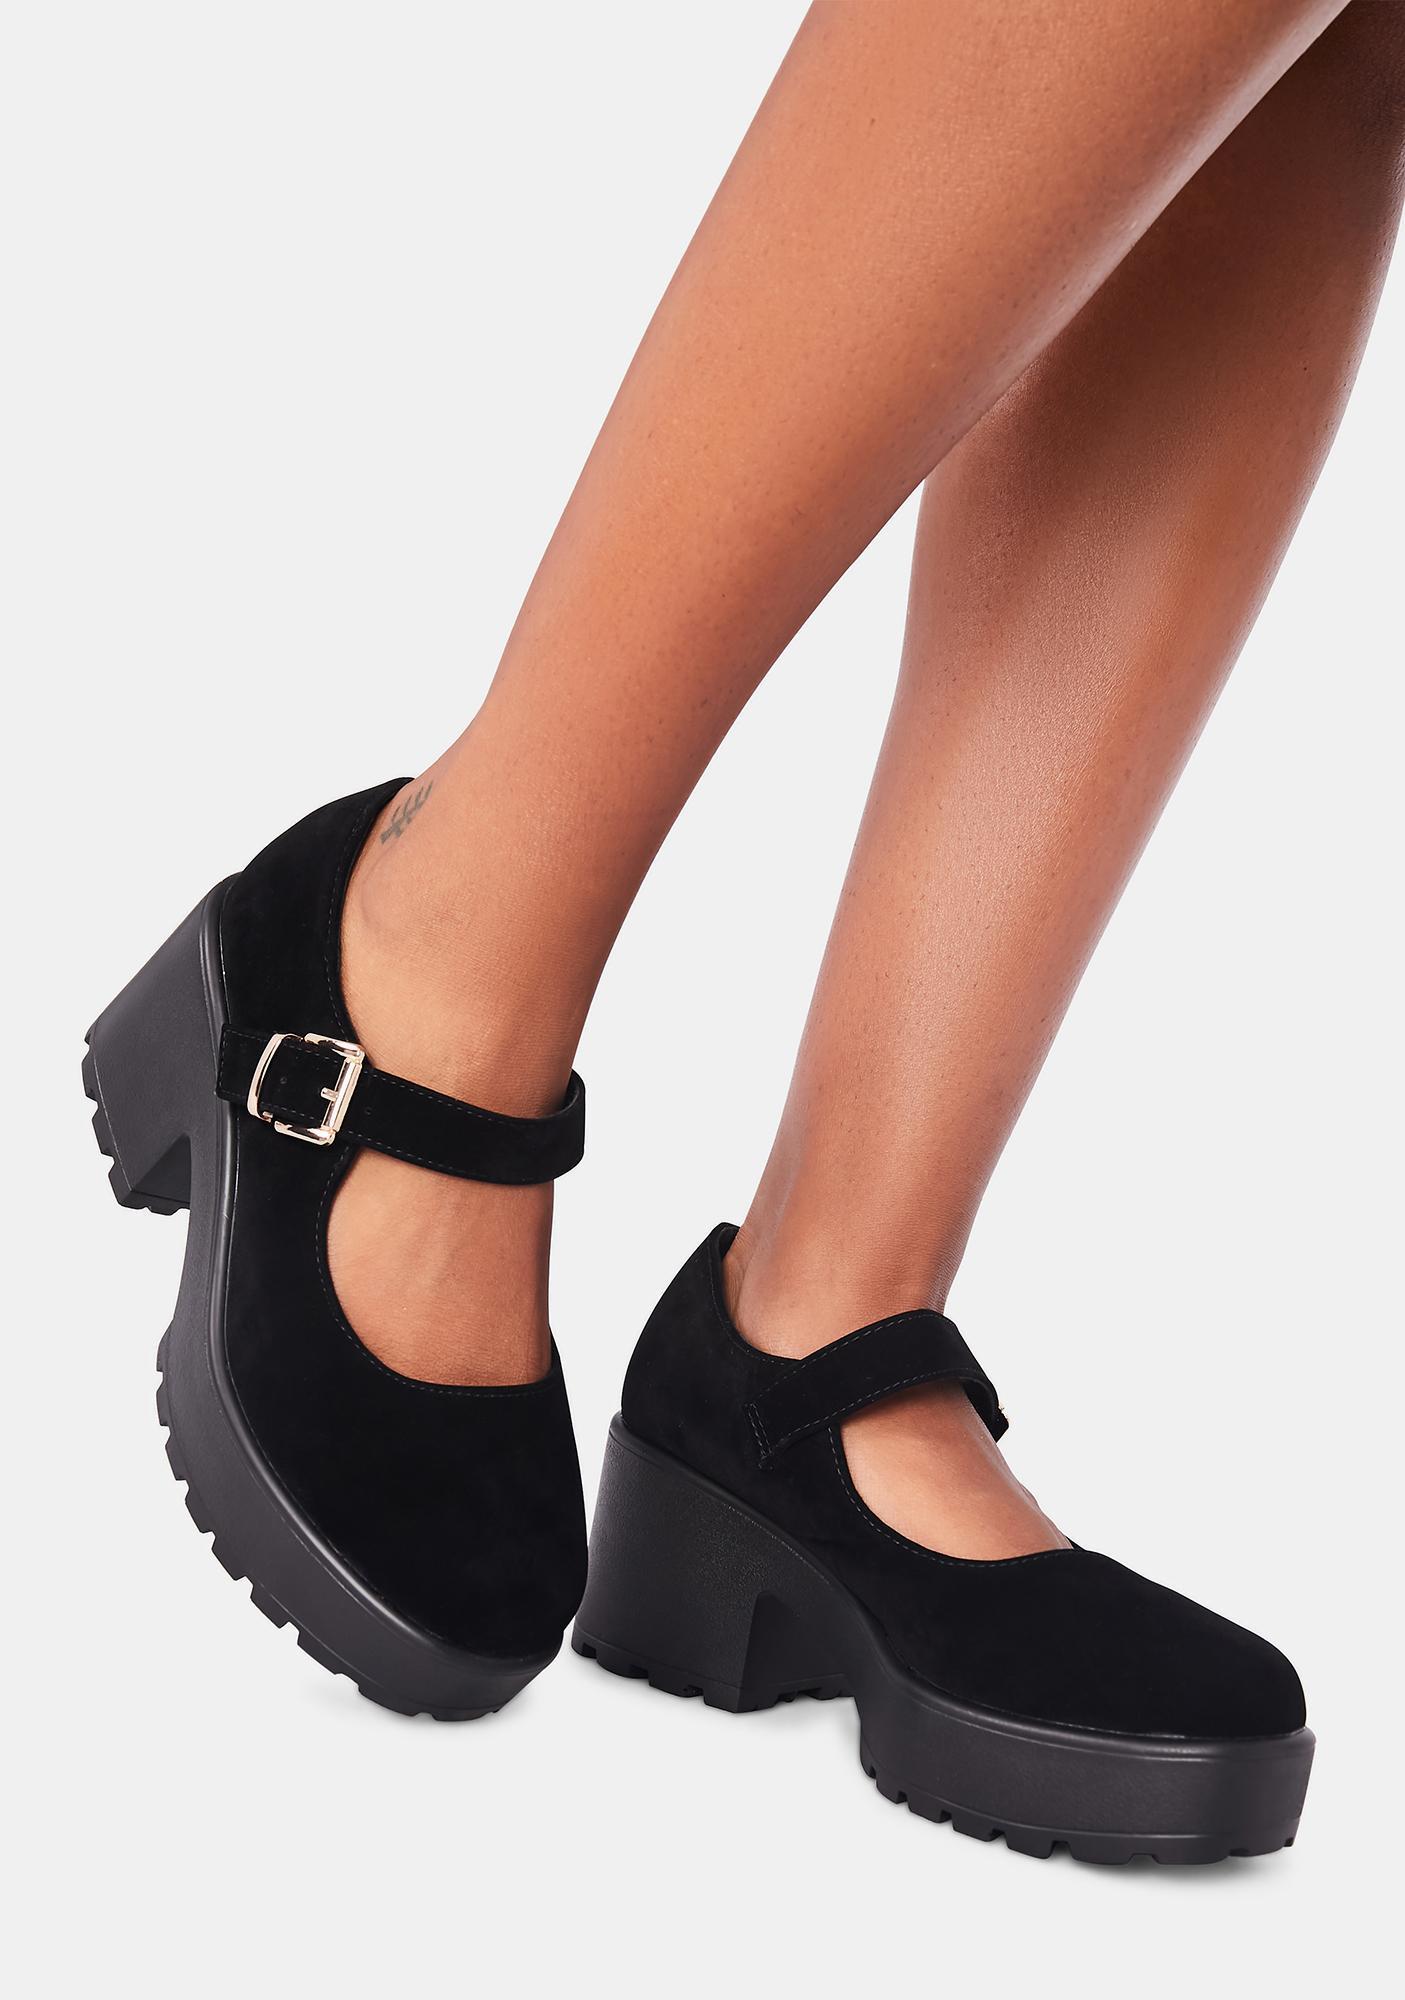 Koi Footwear Tira Mary Janes